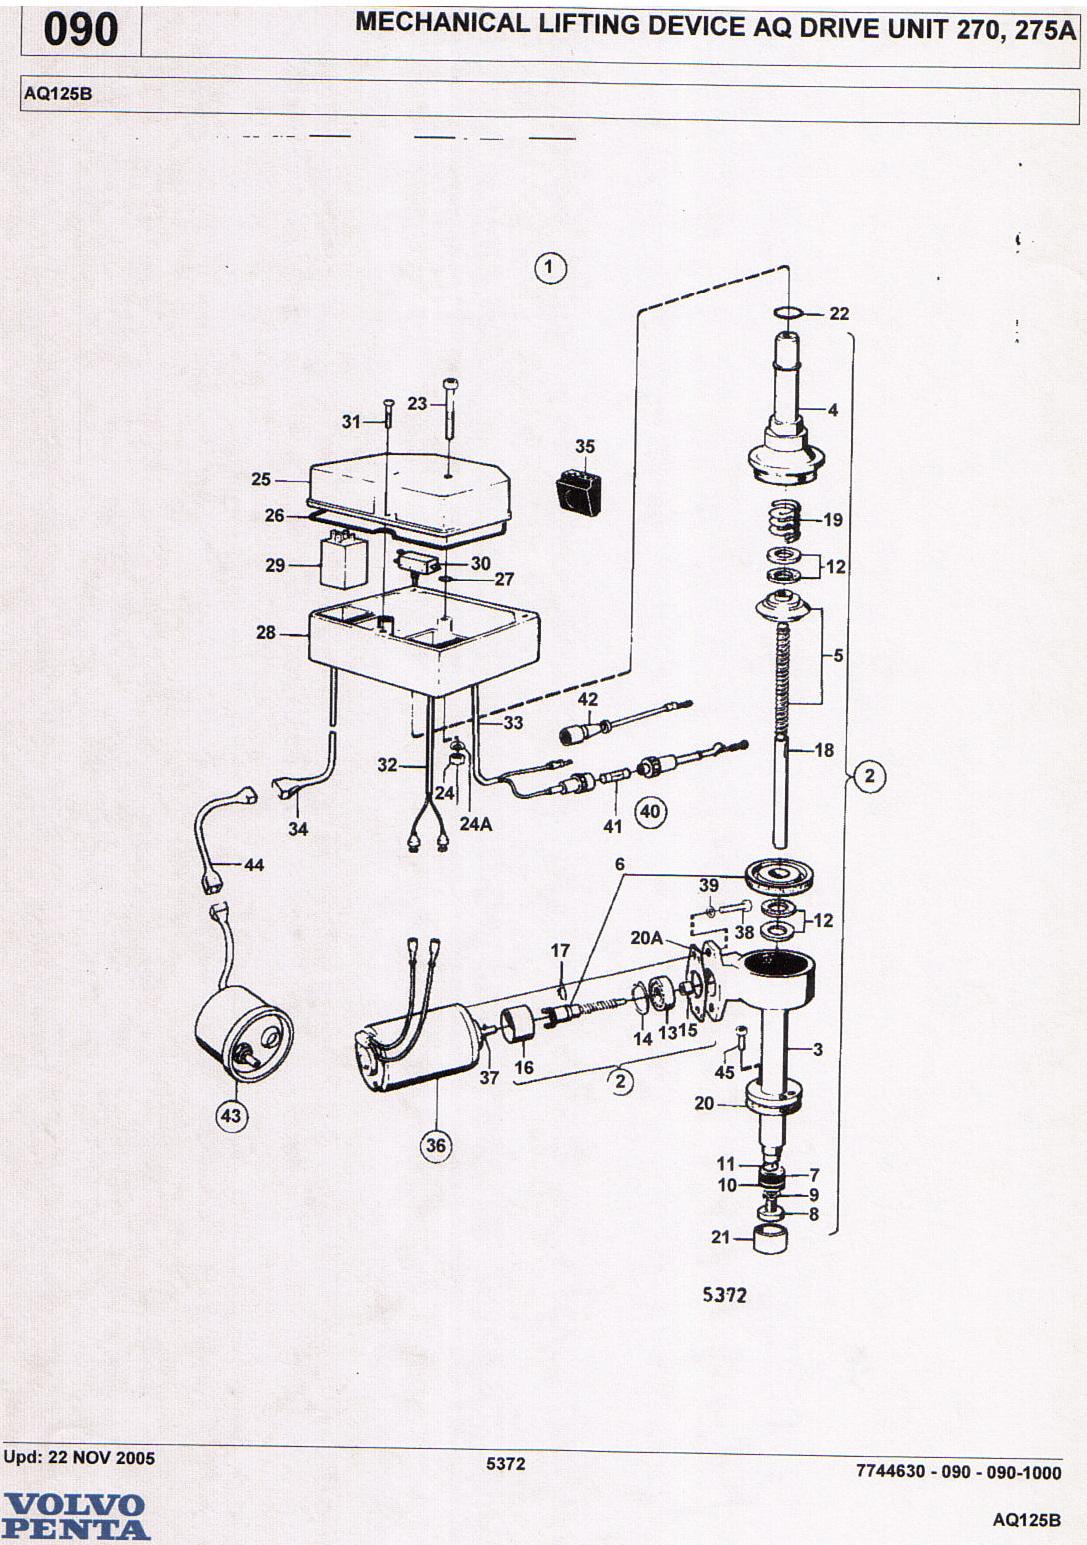 Volvo Penta Mechanical Tilt Wiring Diagram Electrical Diagrams 270 Trim Outdrive Application Motorola Alternator